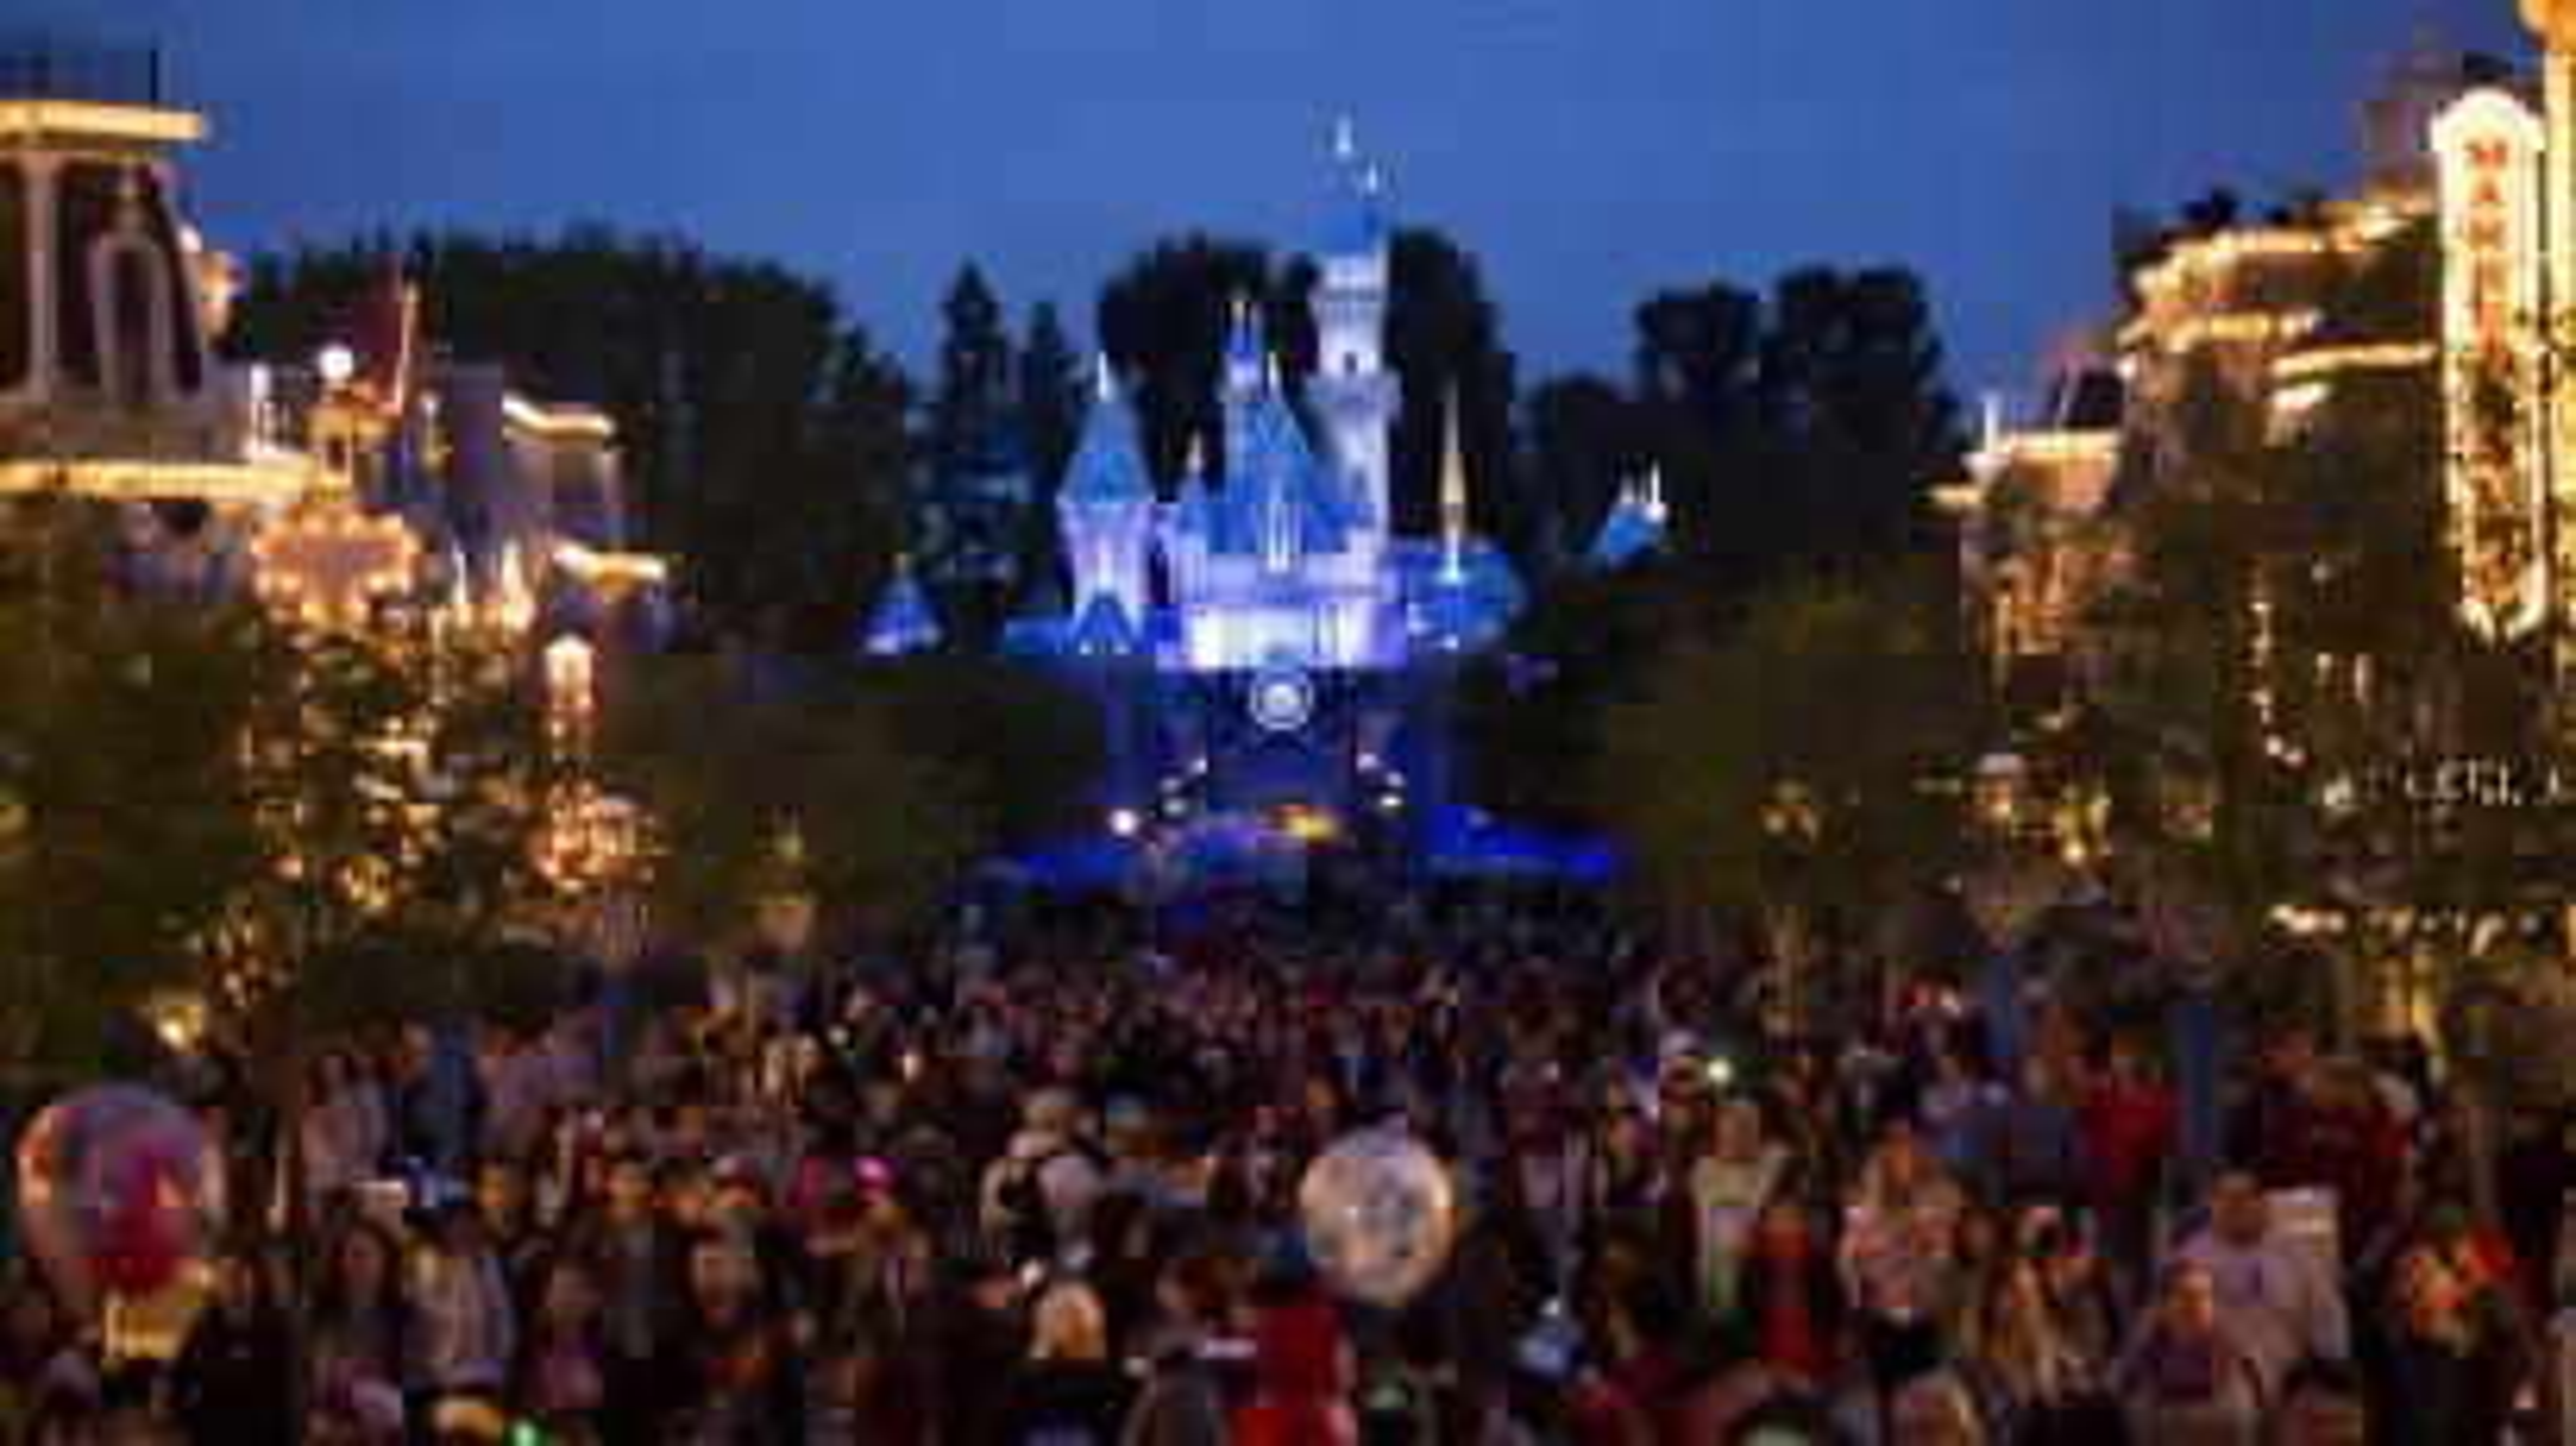 People walk on Main Street during Disneyland's Diamond Celebration in Anaheim